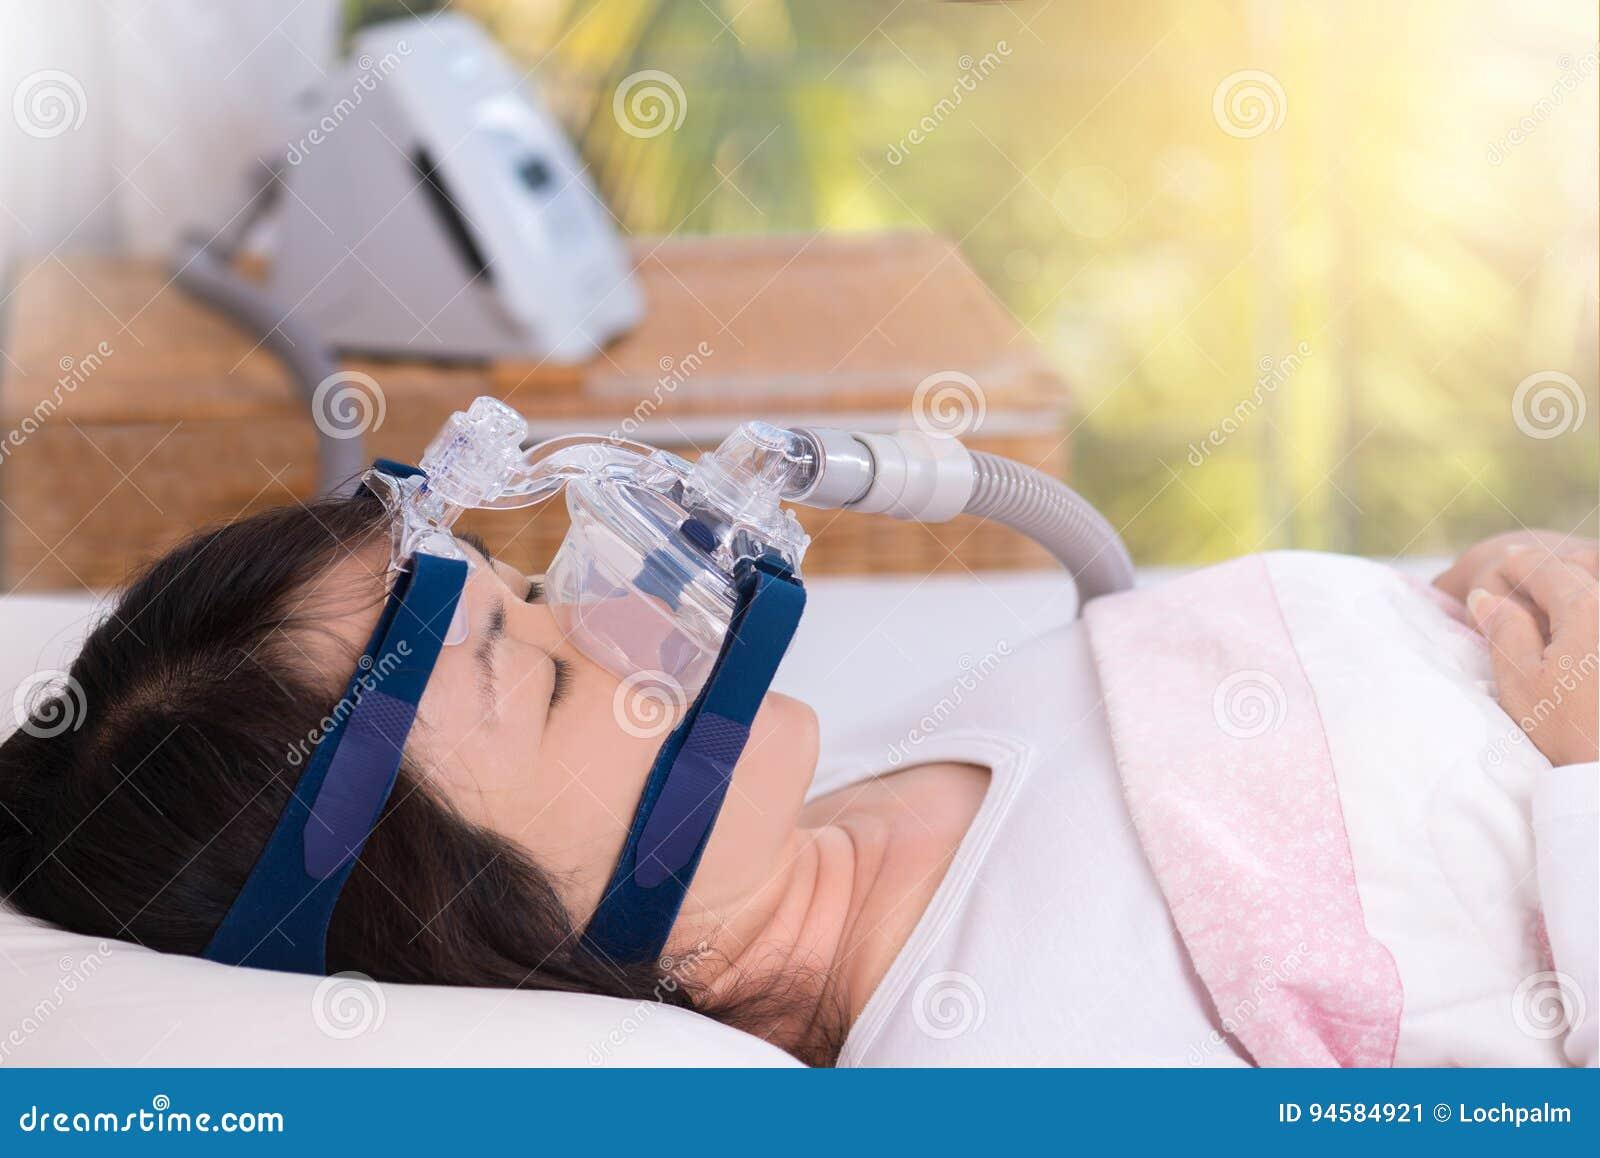 Obstructive sleep apnea therapy, Woman using CPAP machine.